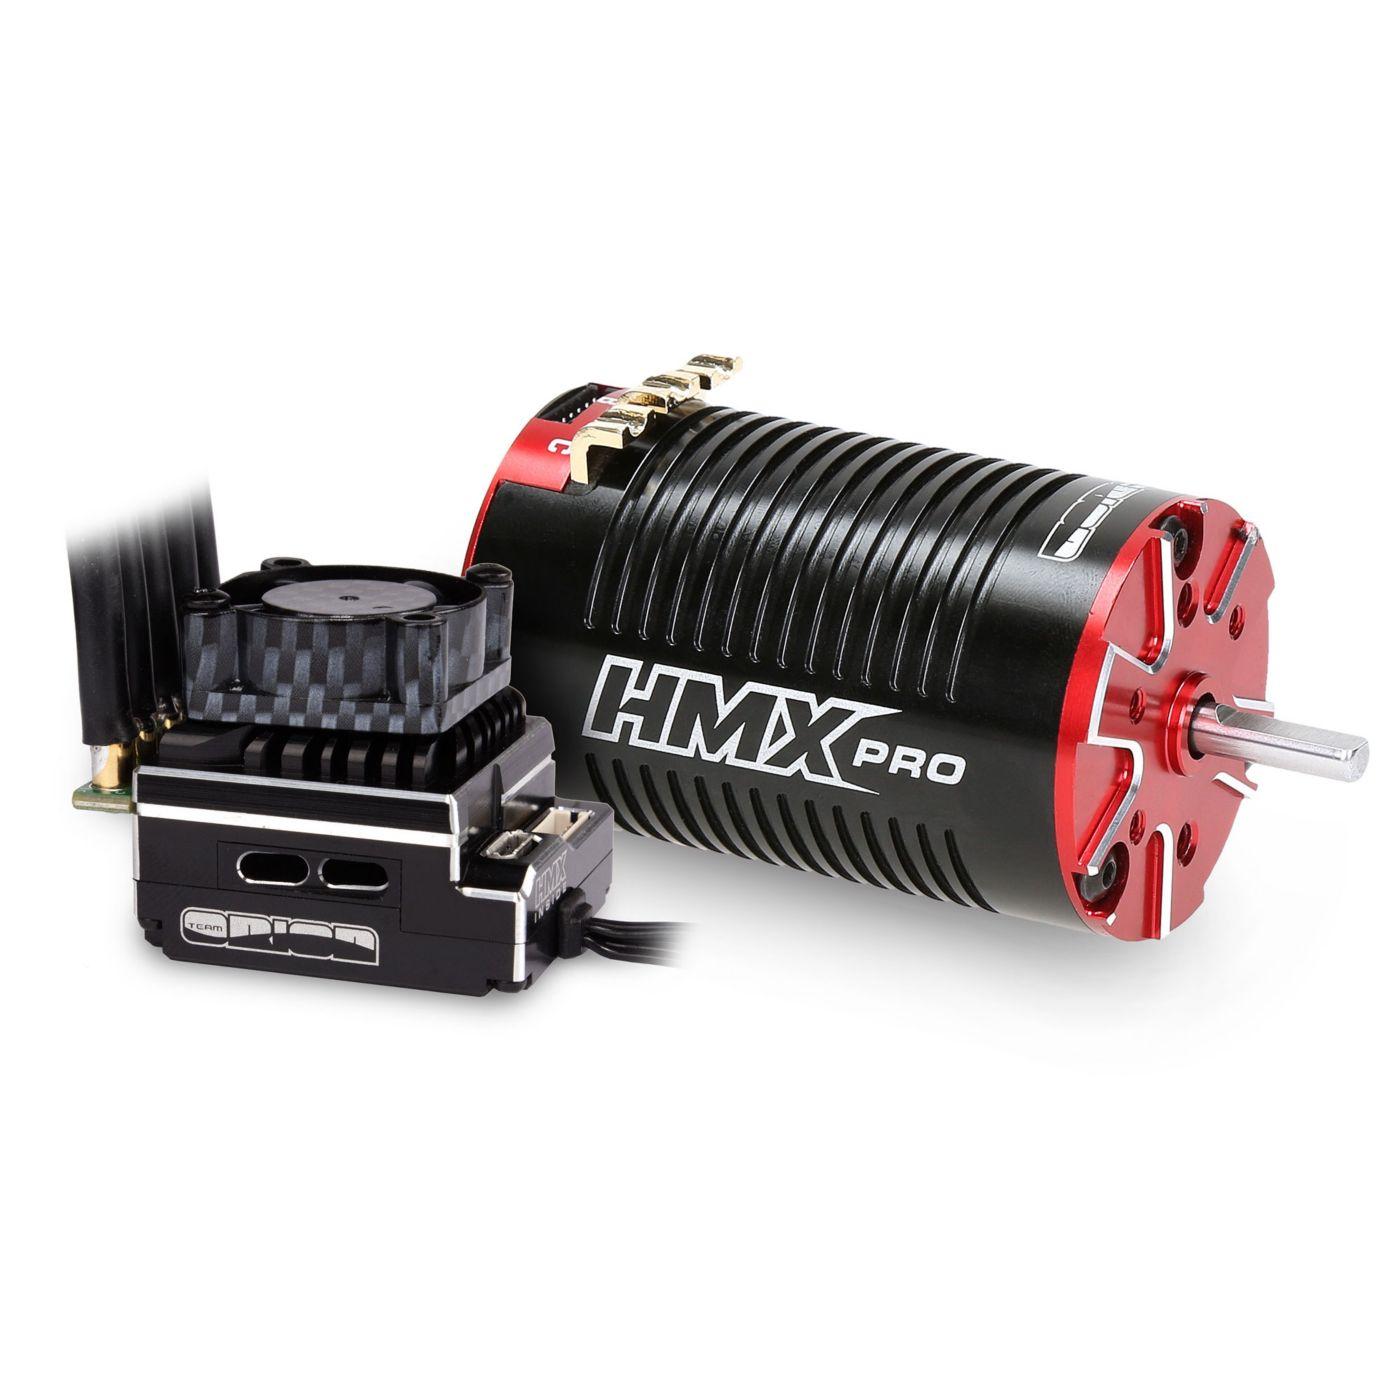 HMX 8 Bundle with 1900Kv Motor  (ORI65143)